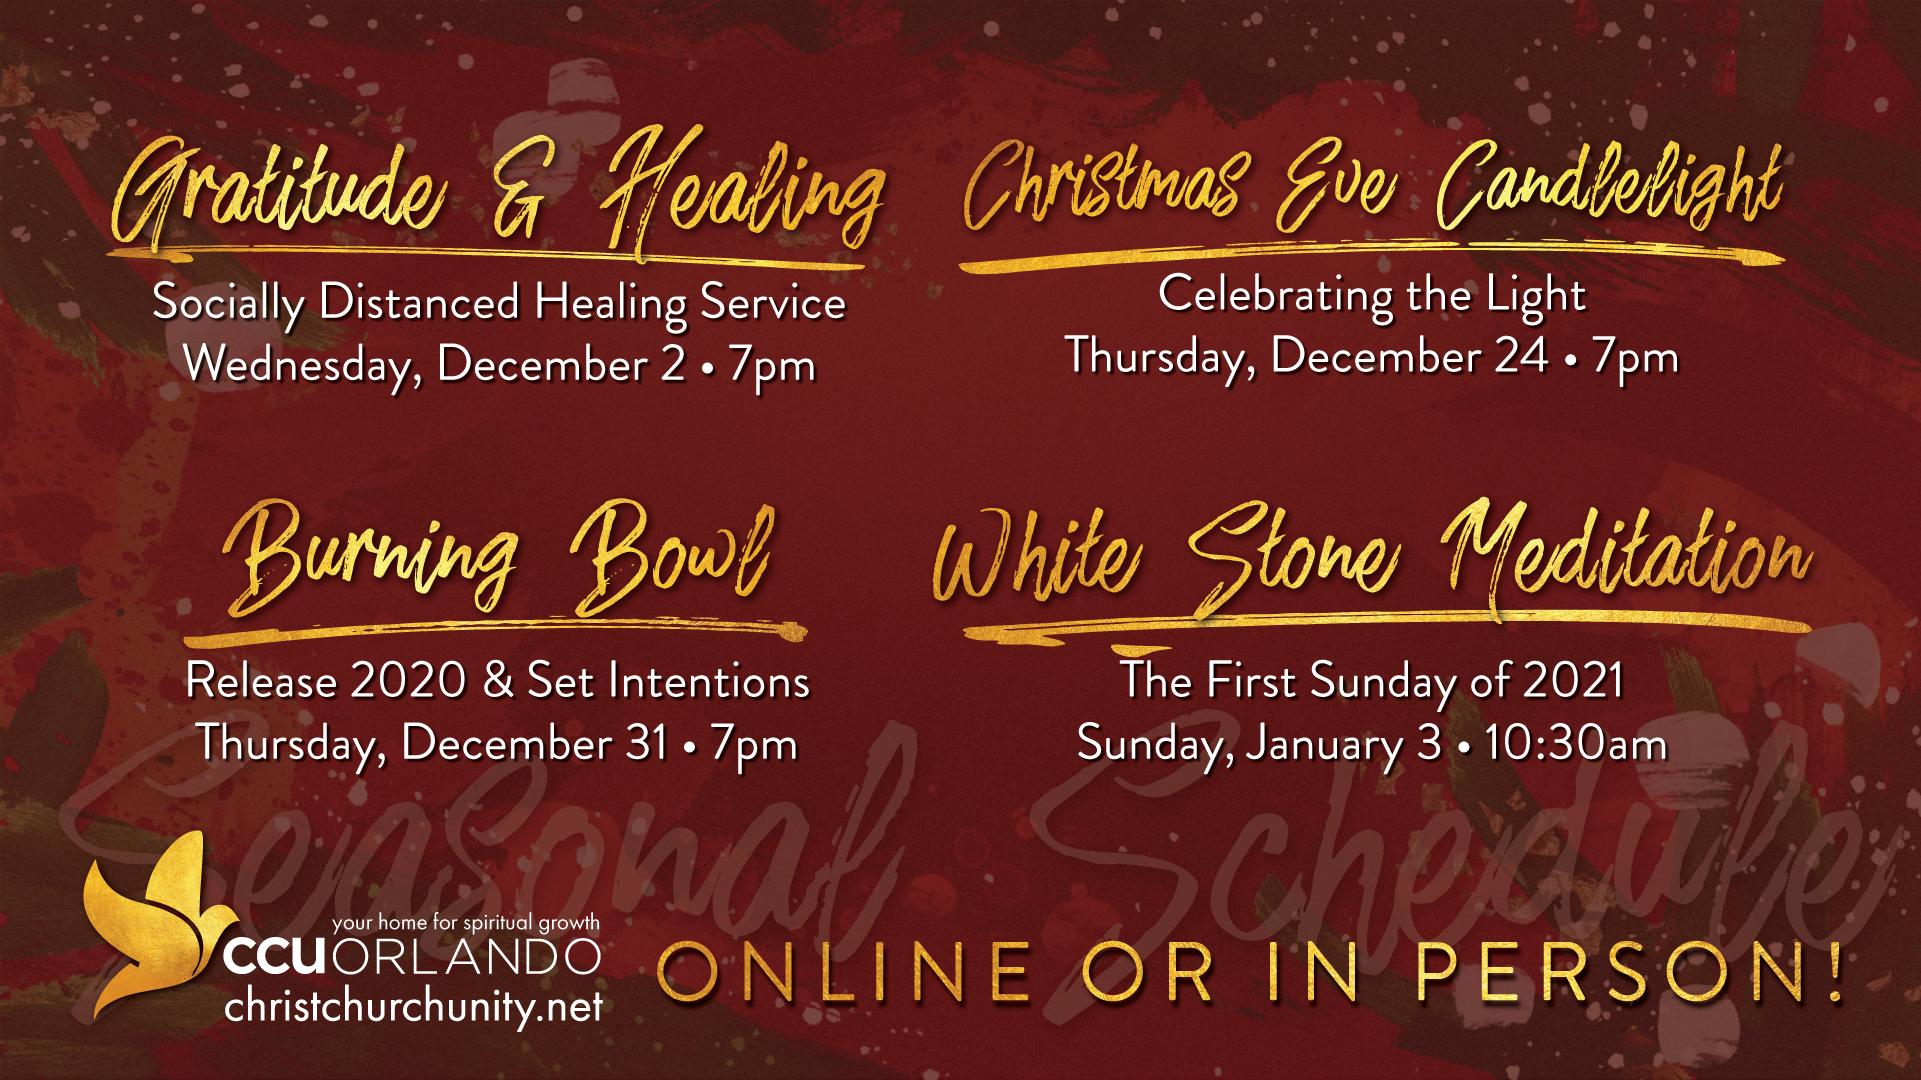 Christmas Schedule At Orlando 2021 Holidays Are Joyful At Ccu Orlando Ccu Orlando